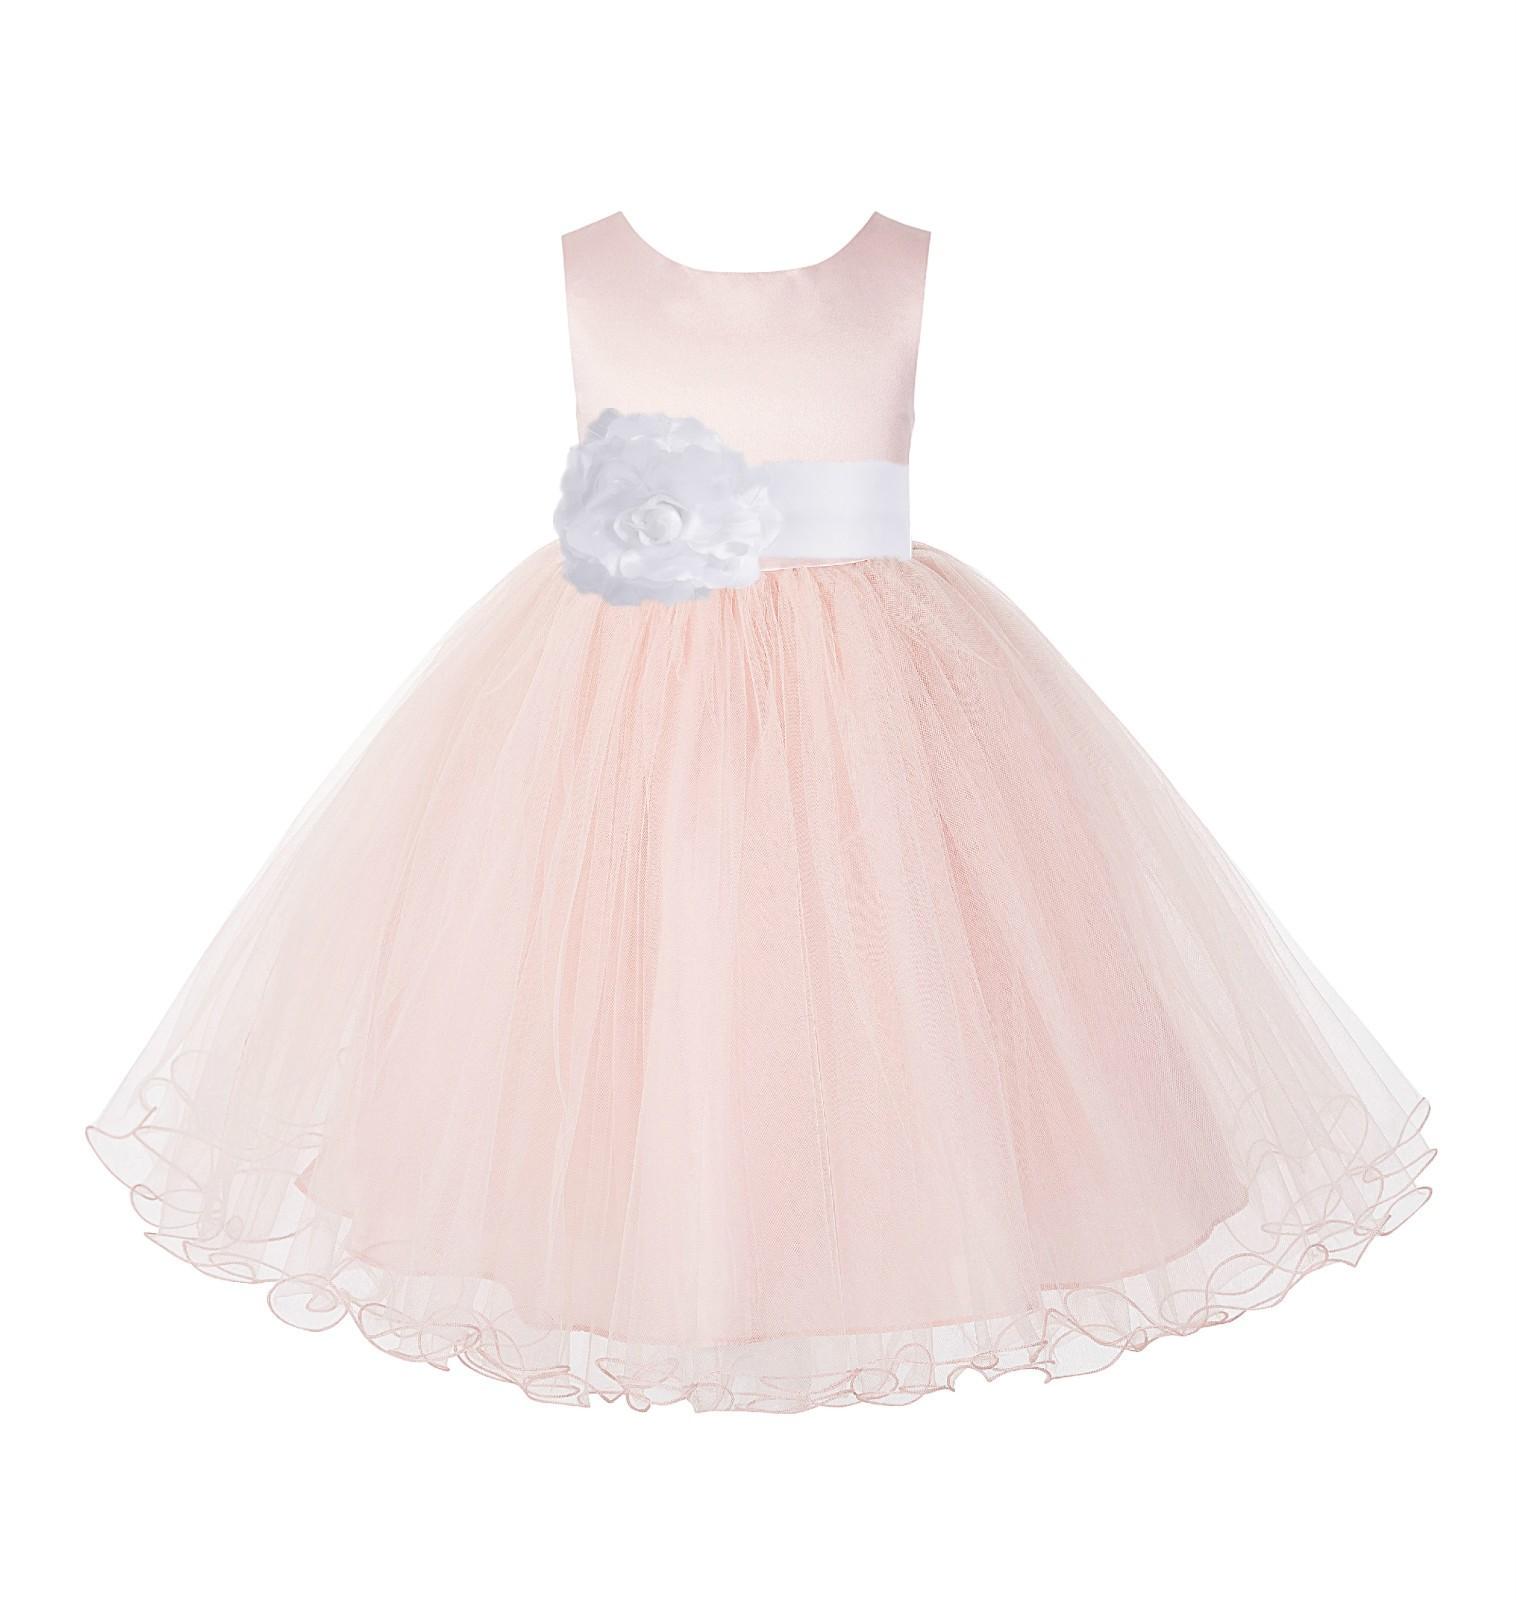 Blush Pink / White Tulle Rattail Edge Flower Girl Dress Pageant Recital 829S